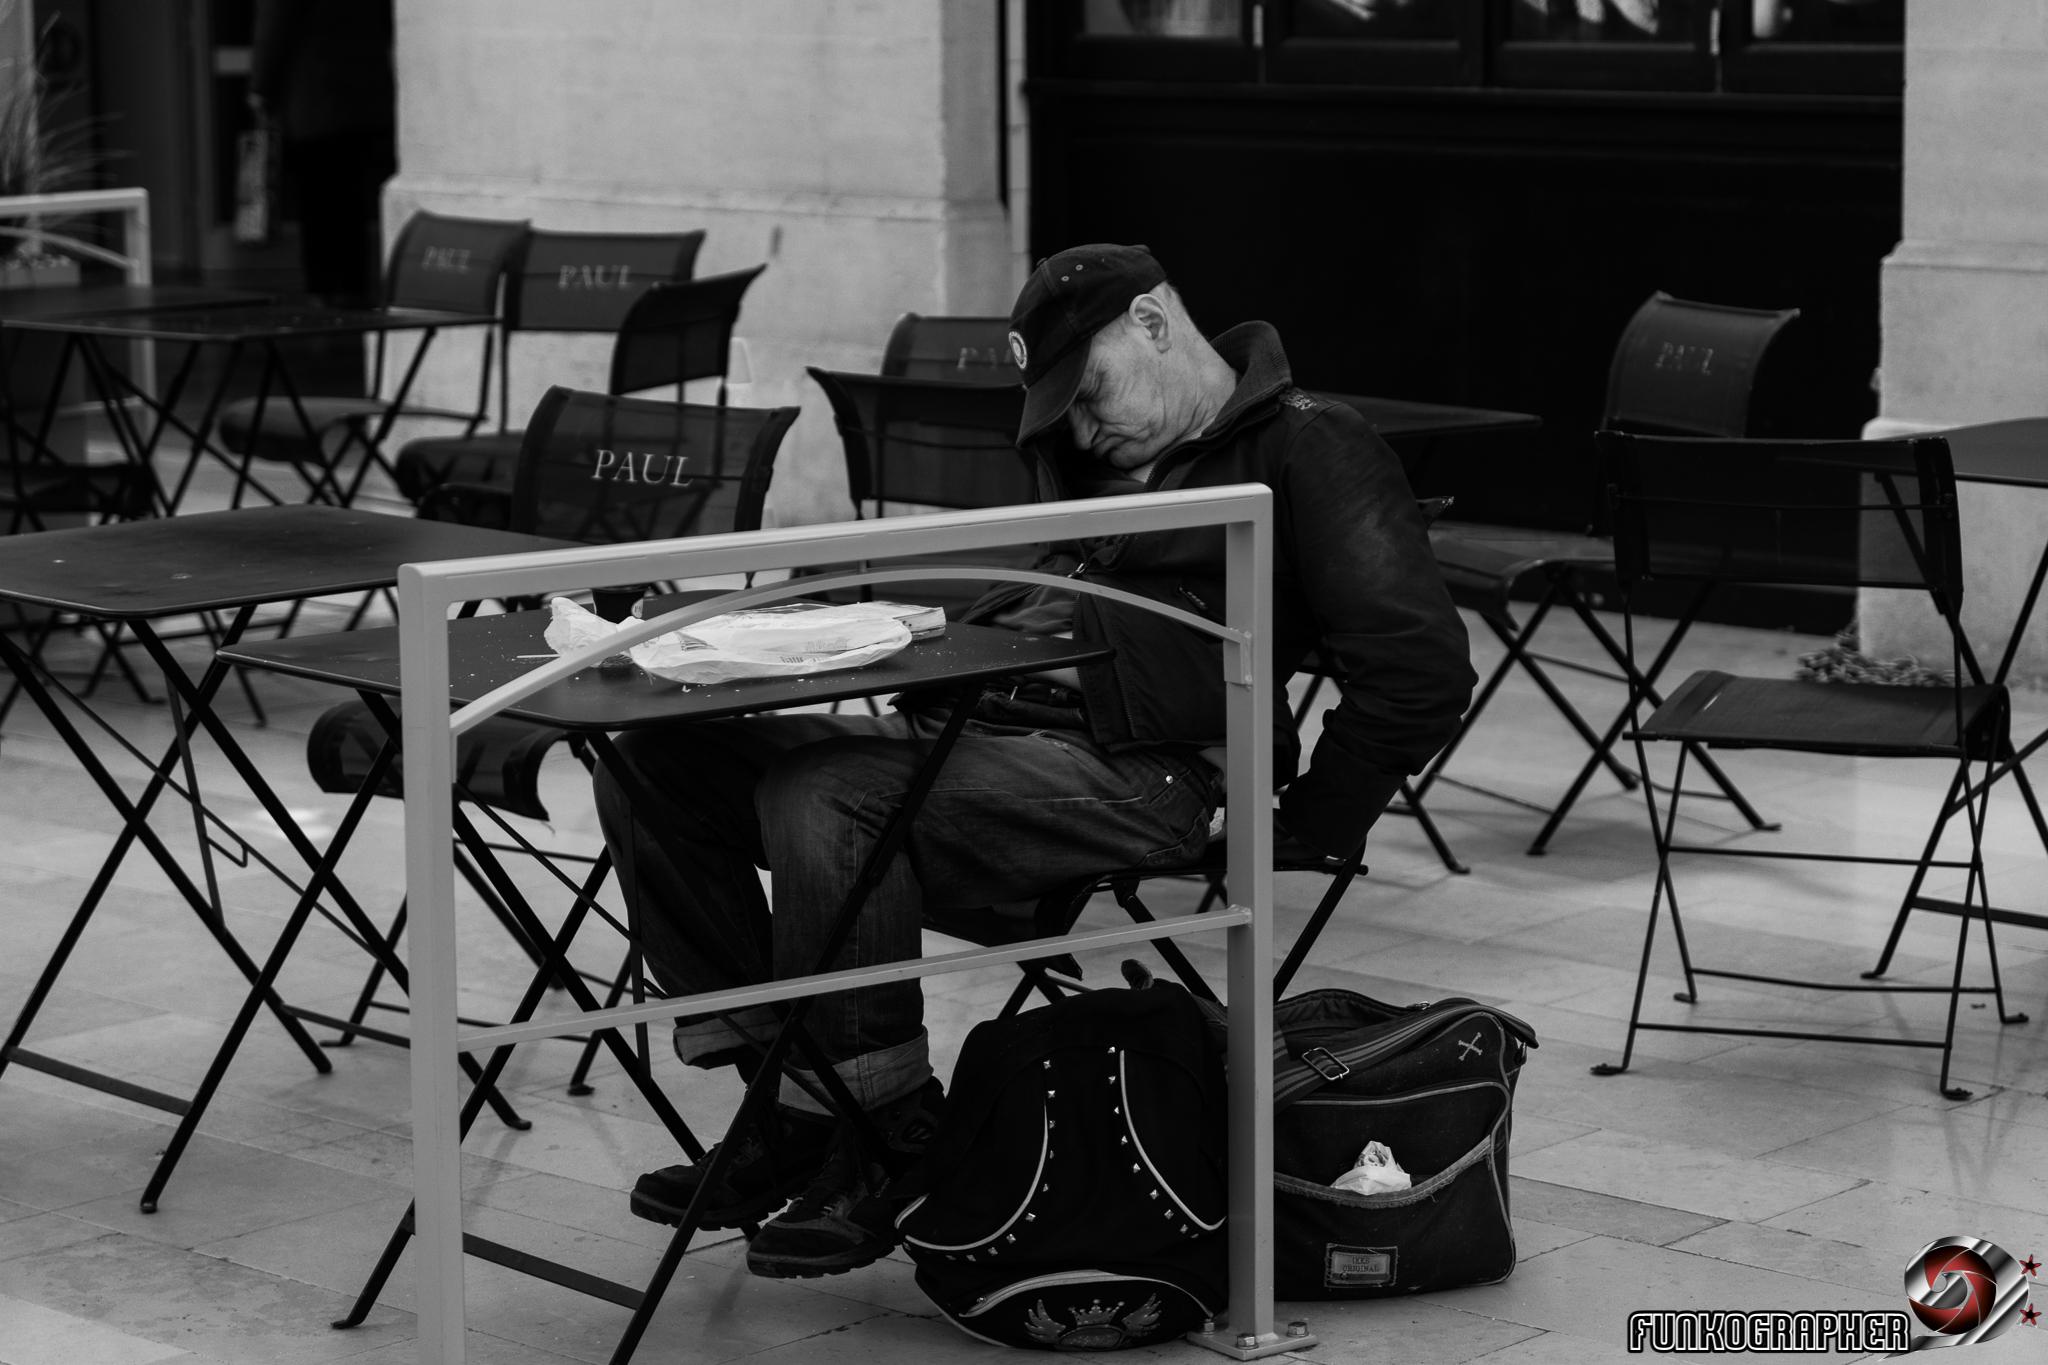 24-70mm, art, Auteur, black and whie, composition, creatif, D850, exposition, fineart, flash, france, french, Funkographer, gare, graphisme, https://funkographer.fr, illustration, light, lightroom, lorraine, n/b, nancy, Nikon, noir et blanc, oeuvre, Photo, photo de rue, photographe, photographer, photographie, photoshop, Portrait, shooting, sigma, SNCF, street, strobism, studio, Tirage